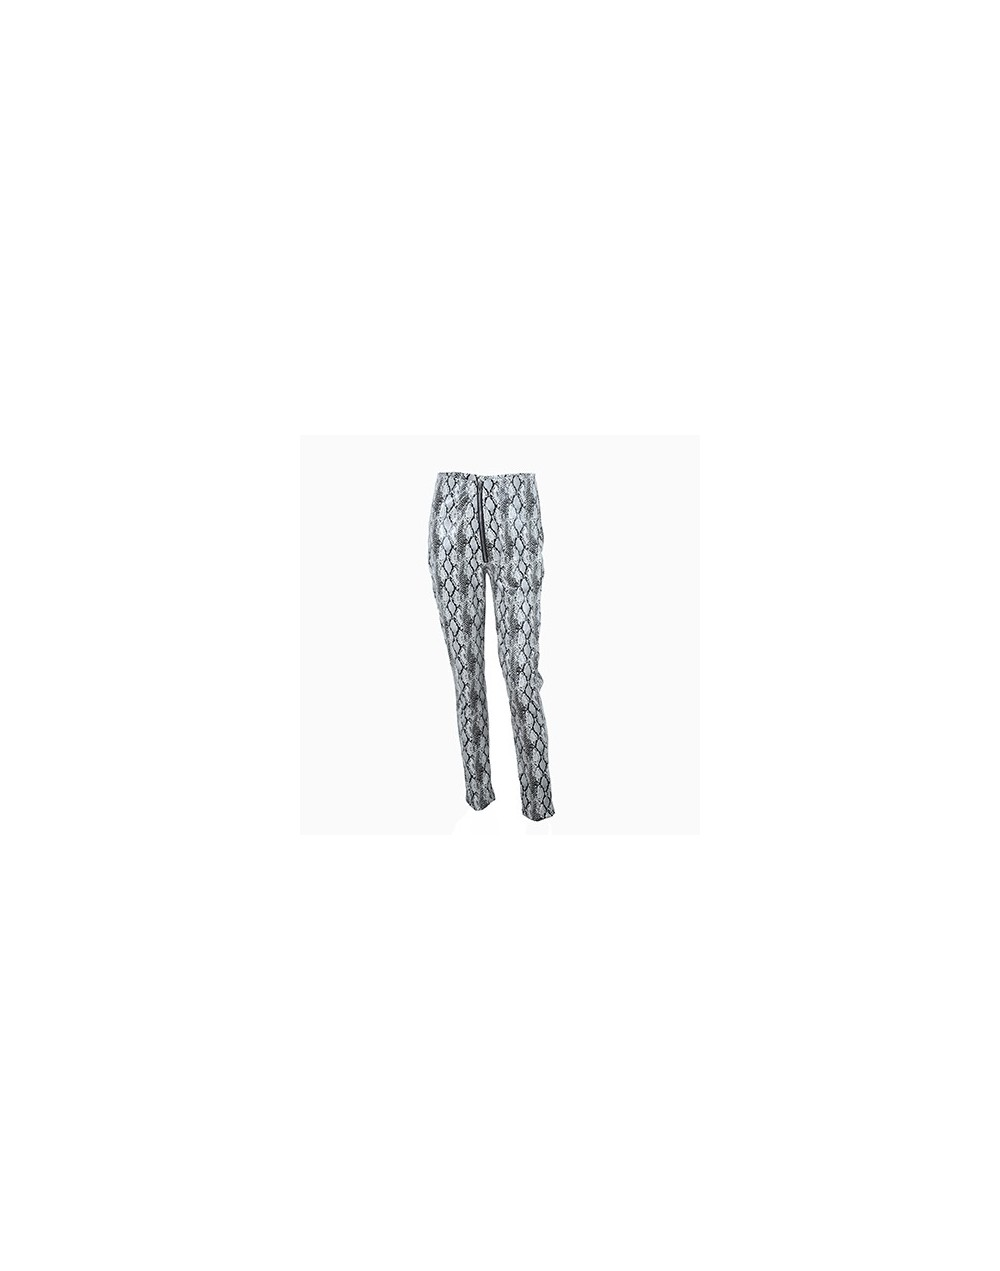 Zipper Snake Print Pants Women PU Leather Pants High Waist Pencil Trousers Skinny Pantalon Femme Streetwear 2019 New Gray - ...